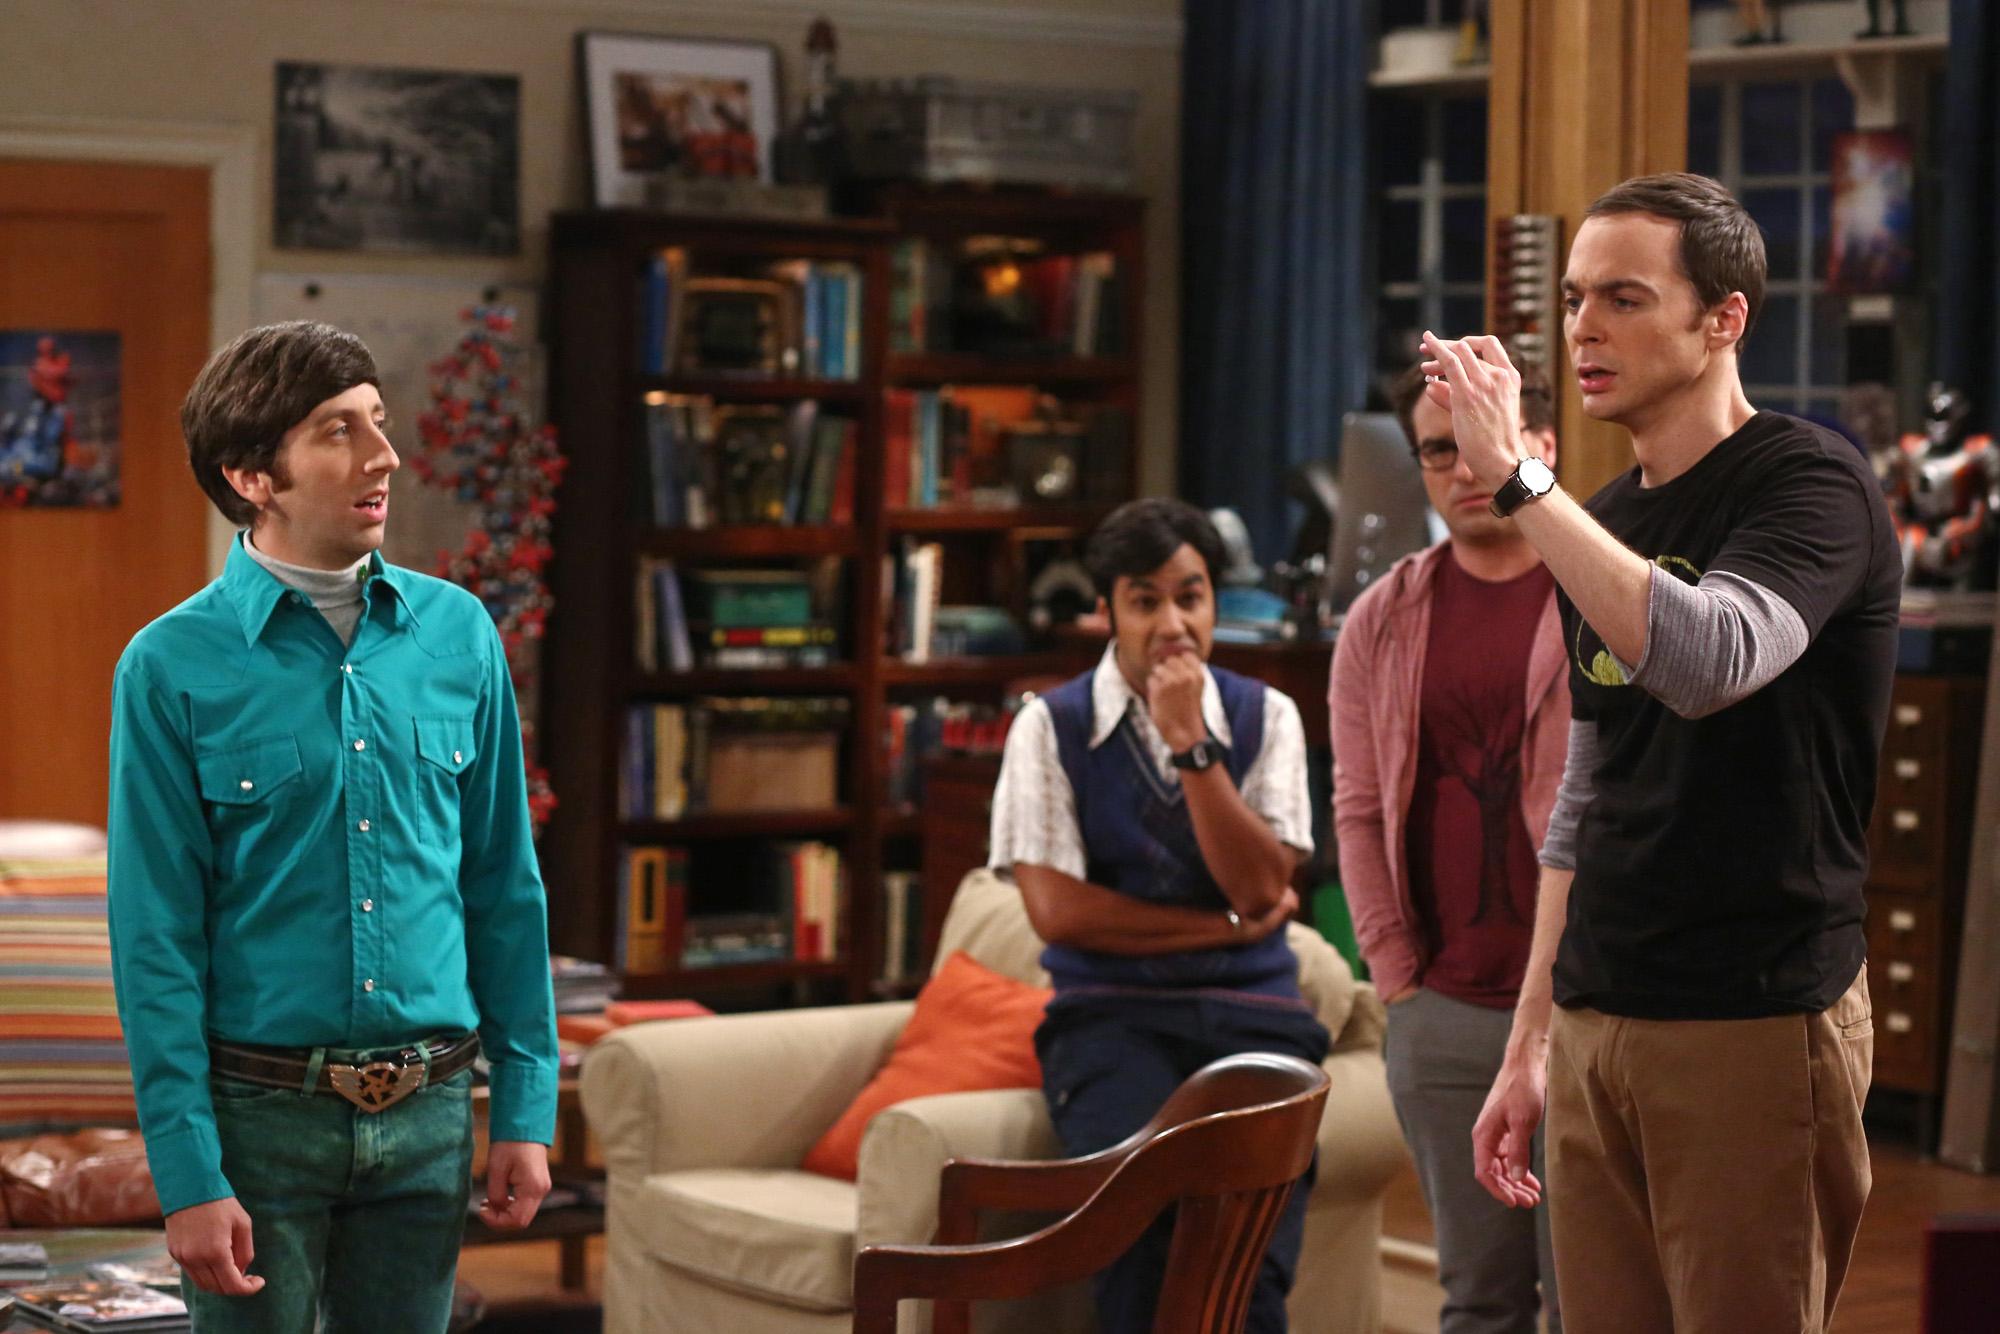 Sheldon makes a point